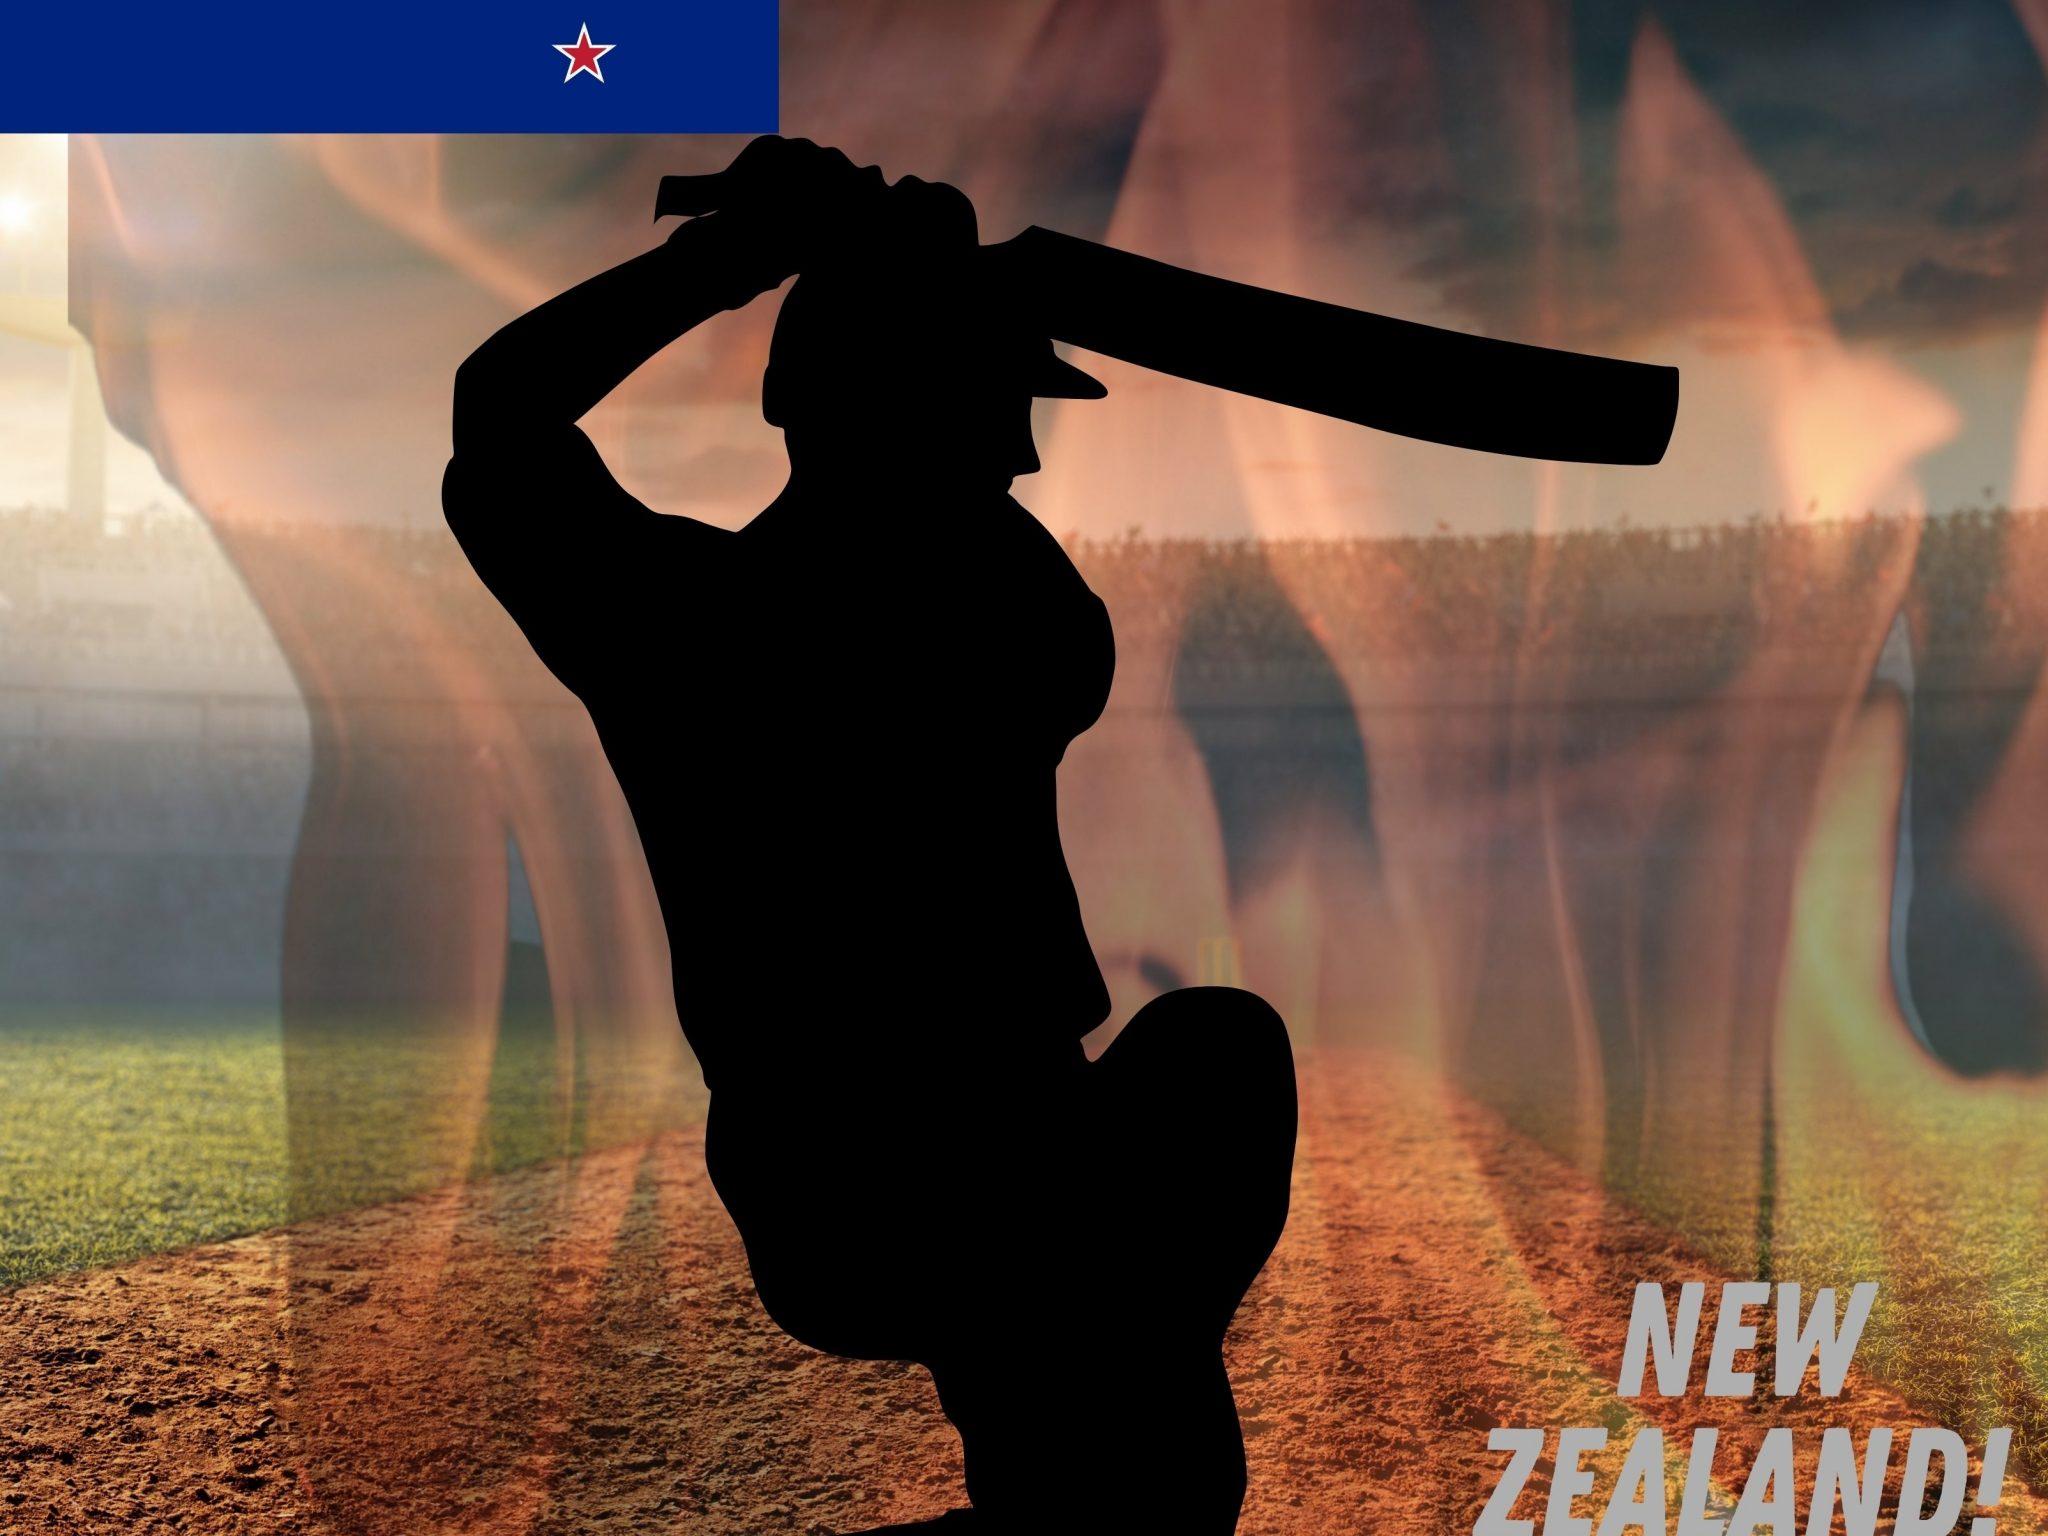 2048x1536 wallpaper New Zealand Cricket Stadium iPad Wallpaper 2048x1536 pixels resolution